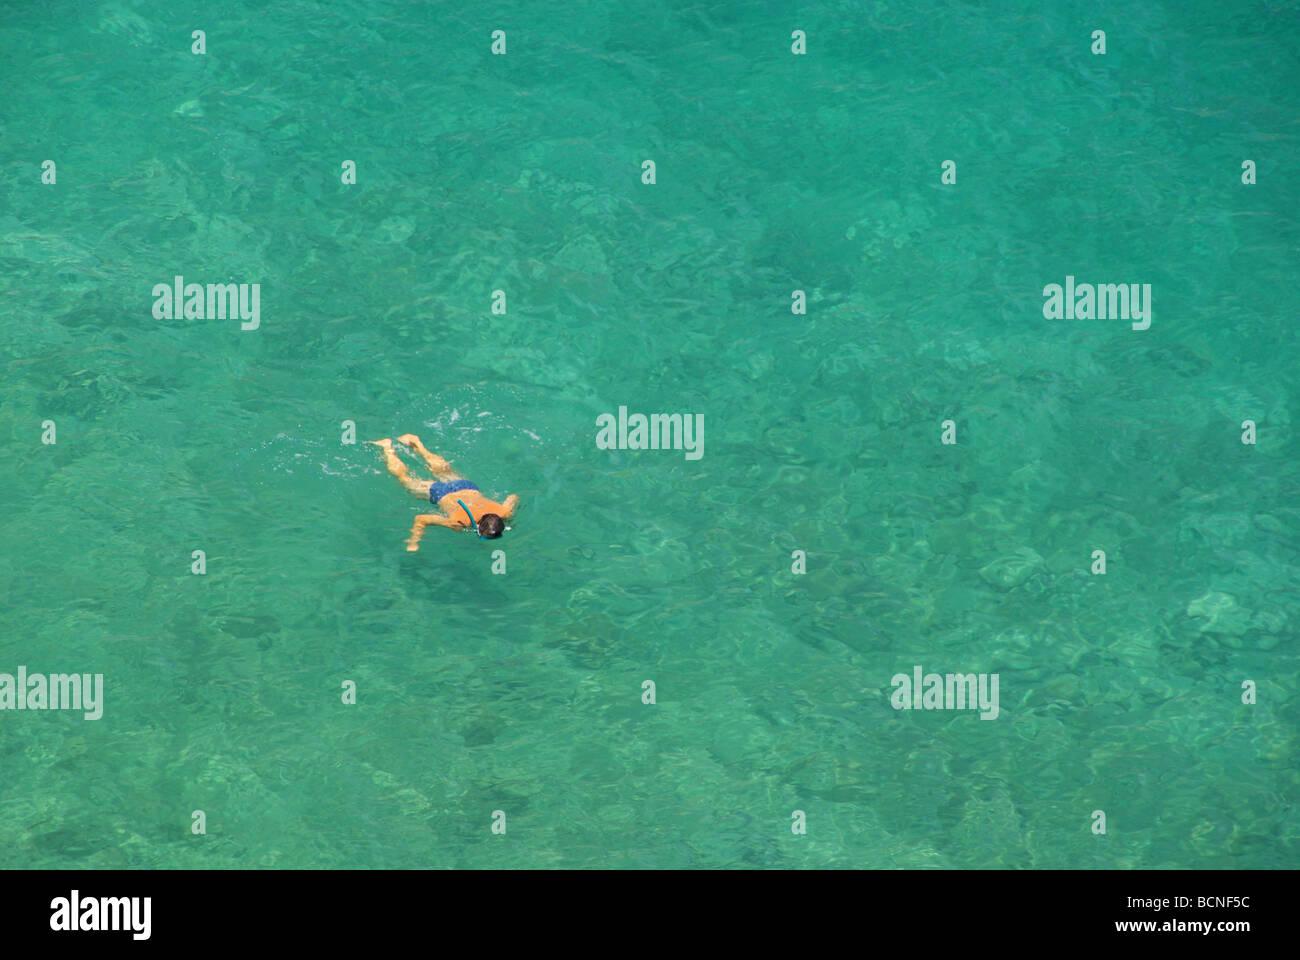 Schnorcheln snorkeling 01 - Stock Image